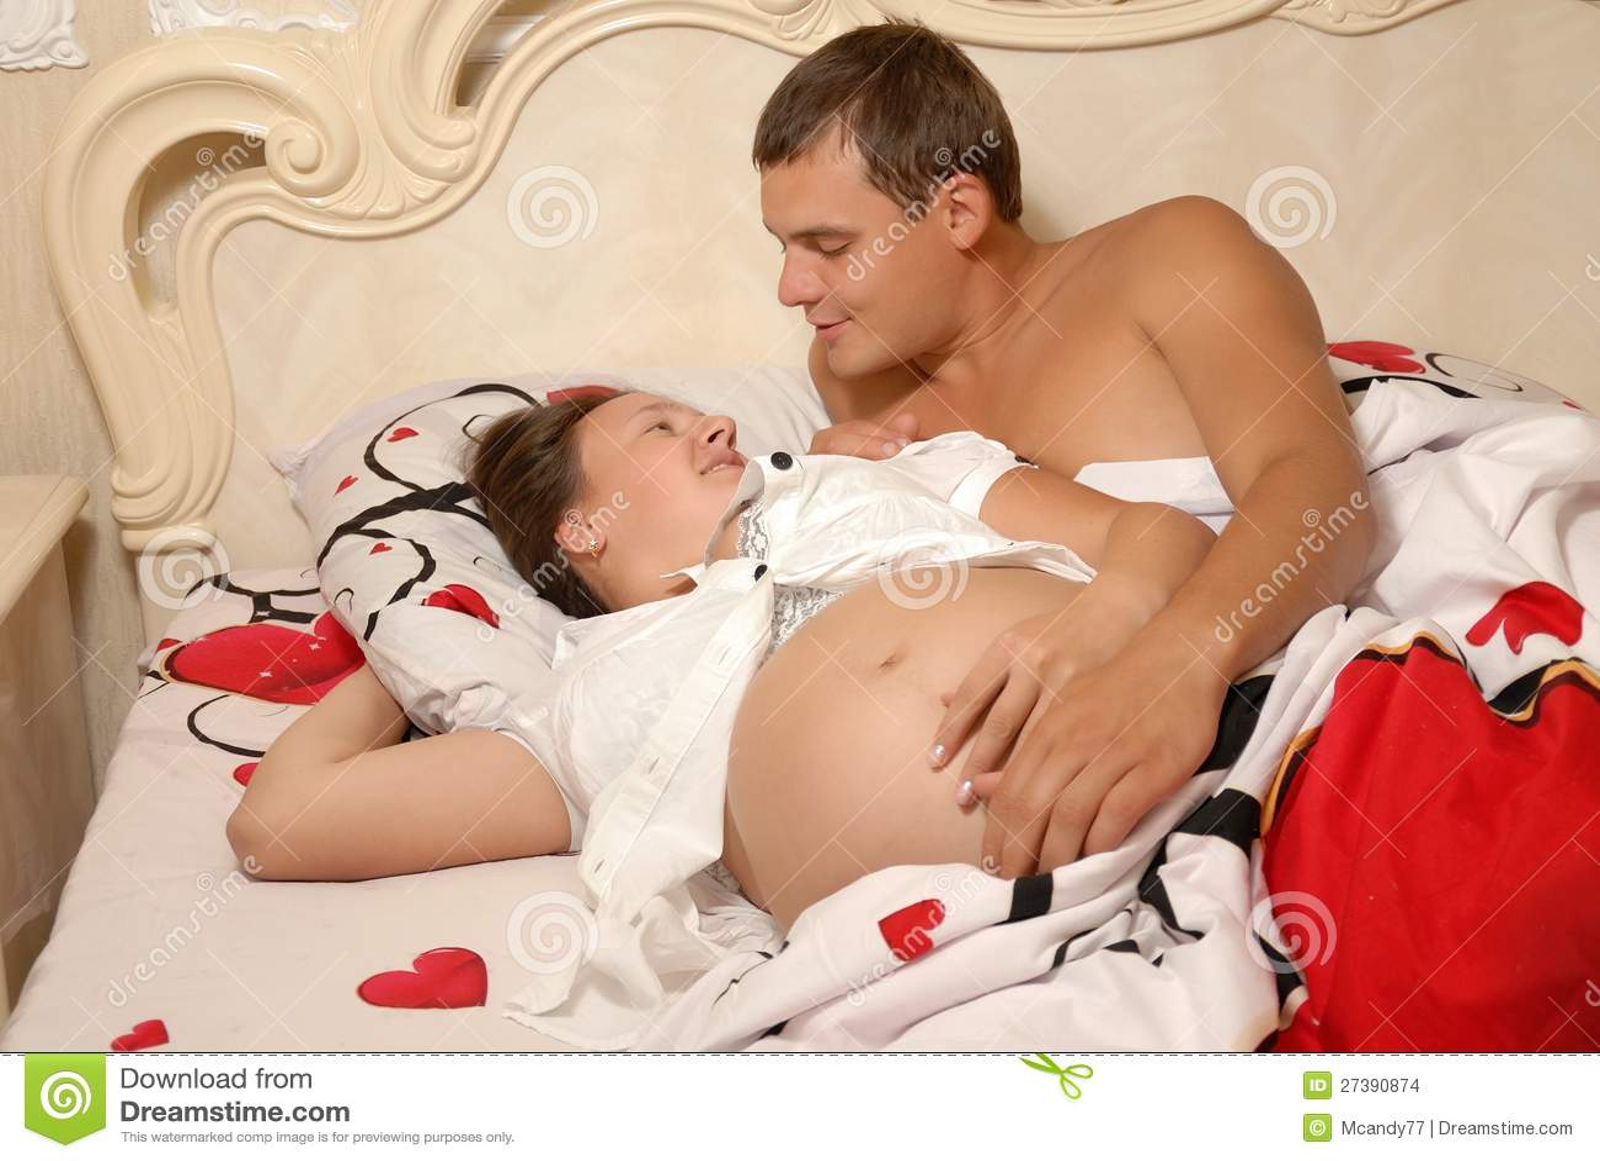 Women with women in love in bed